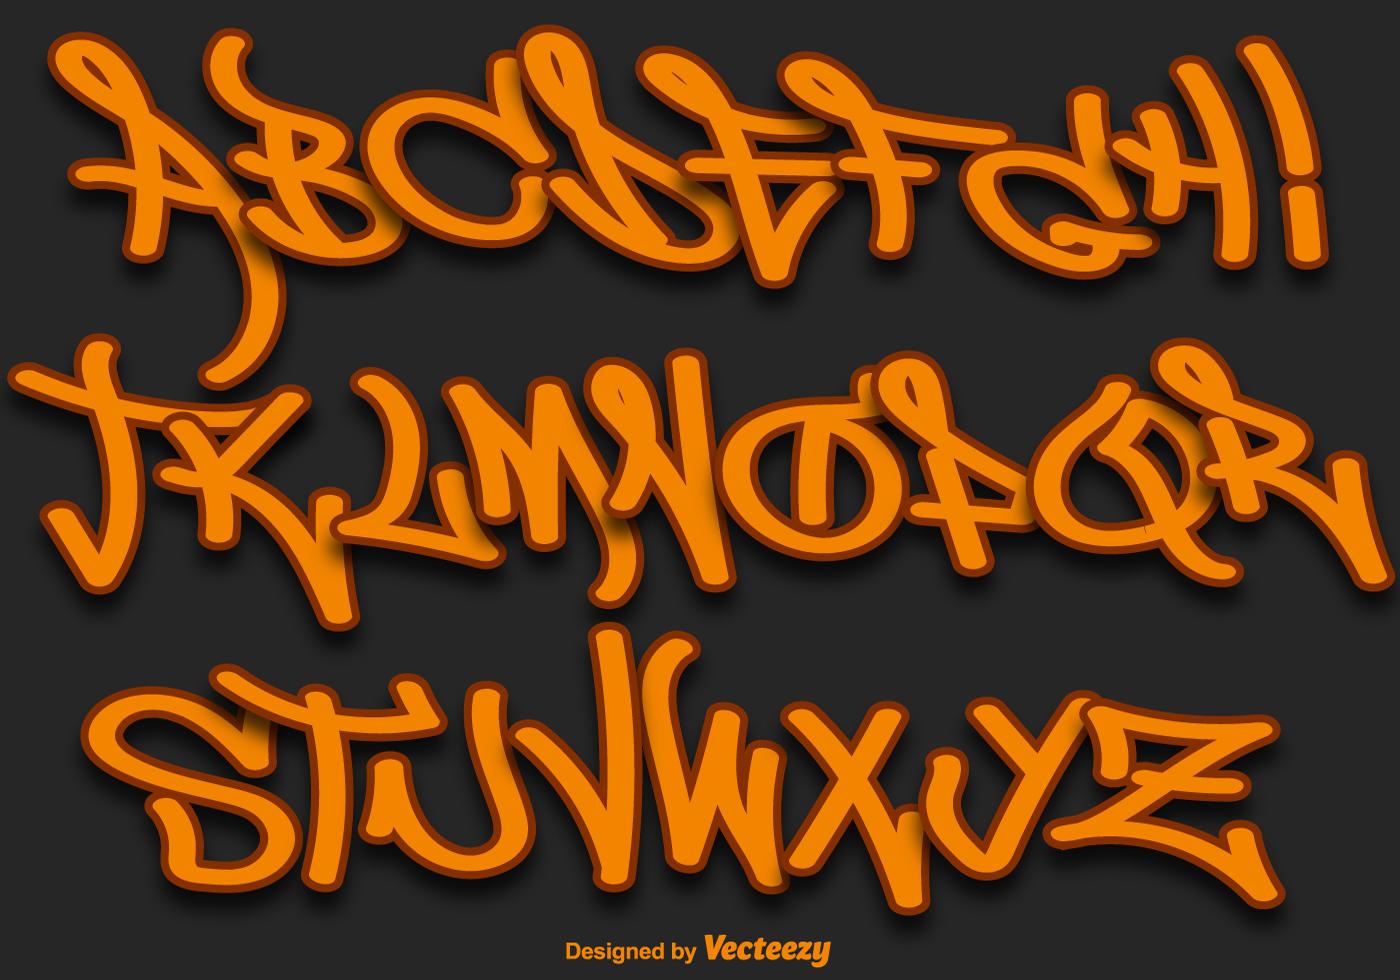 Graffiti Font Free Vector Art 2003 Free Downloads